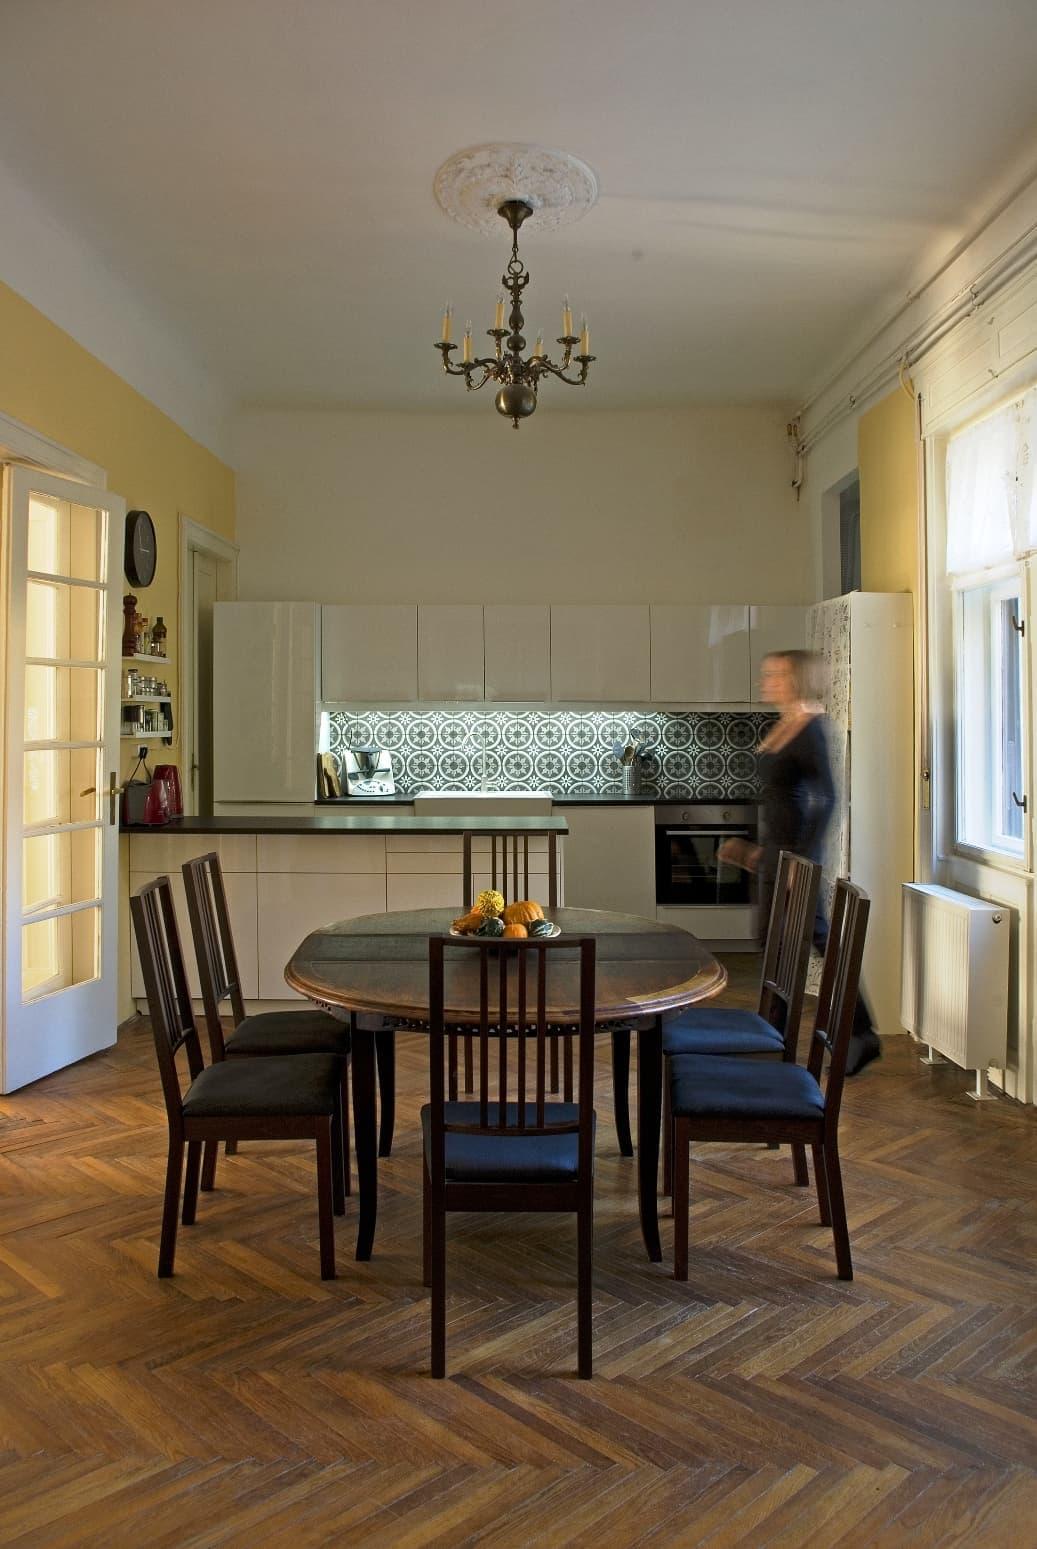 madeira in der k che marrakesh zementfliesen. Black Bedroom Furniture Sets. Home Design Ideas